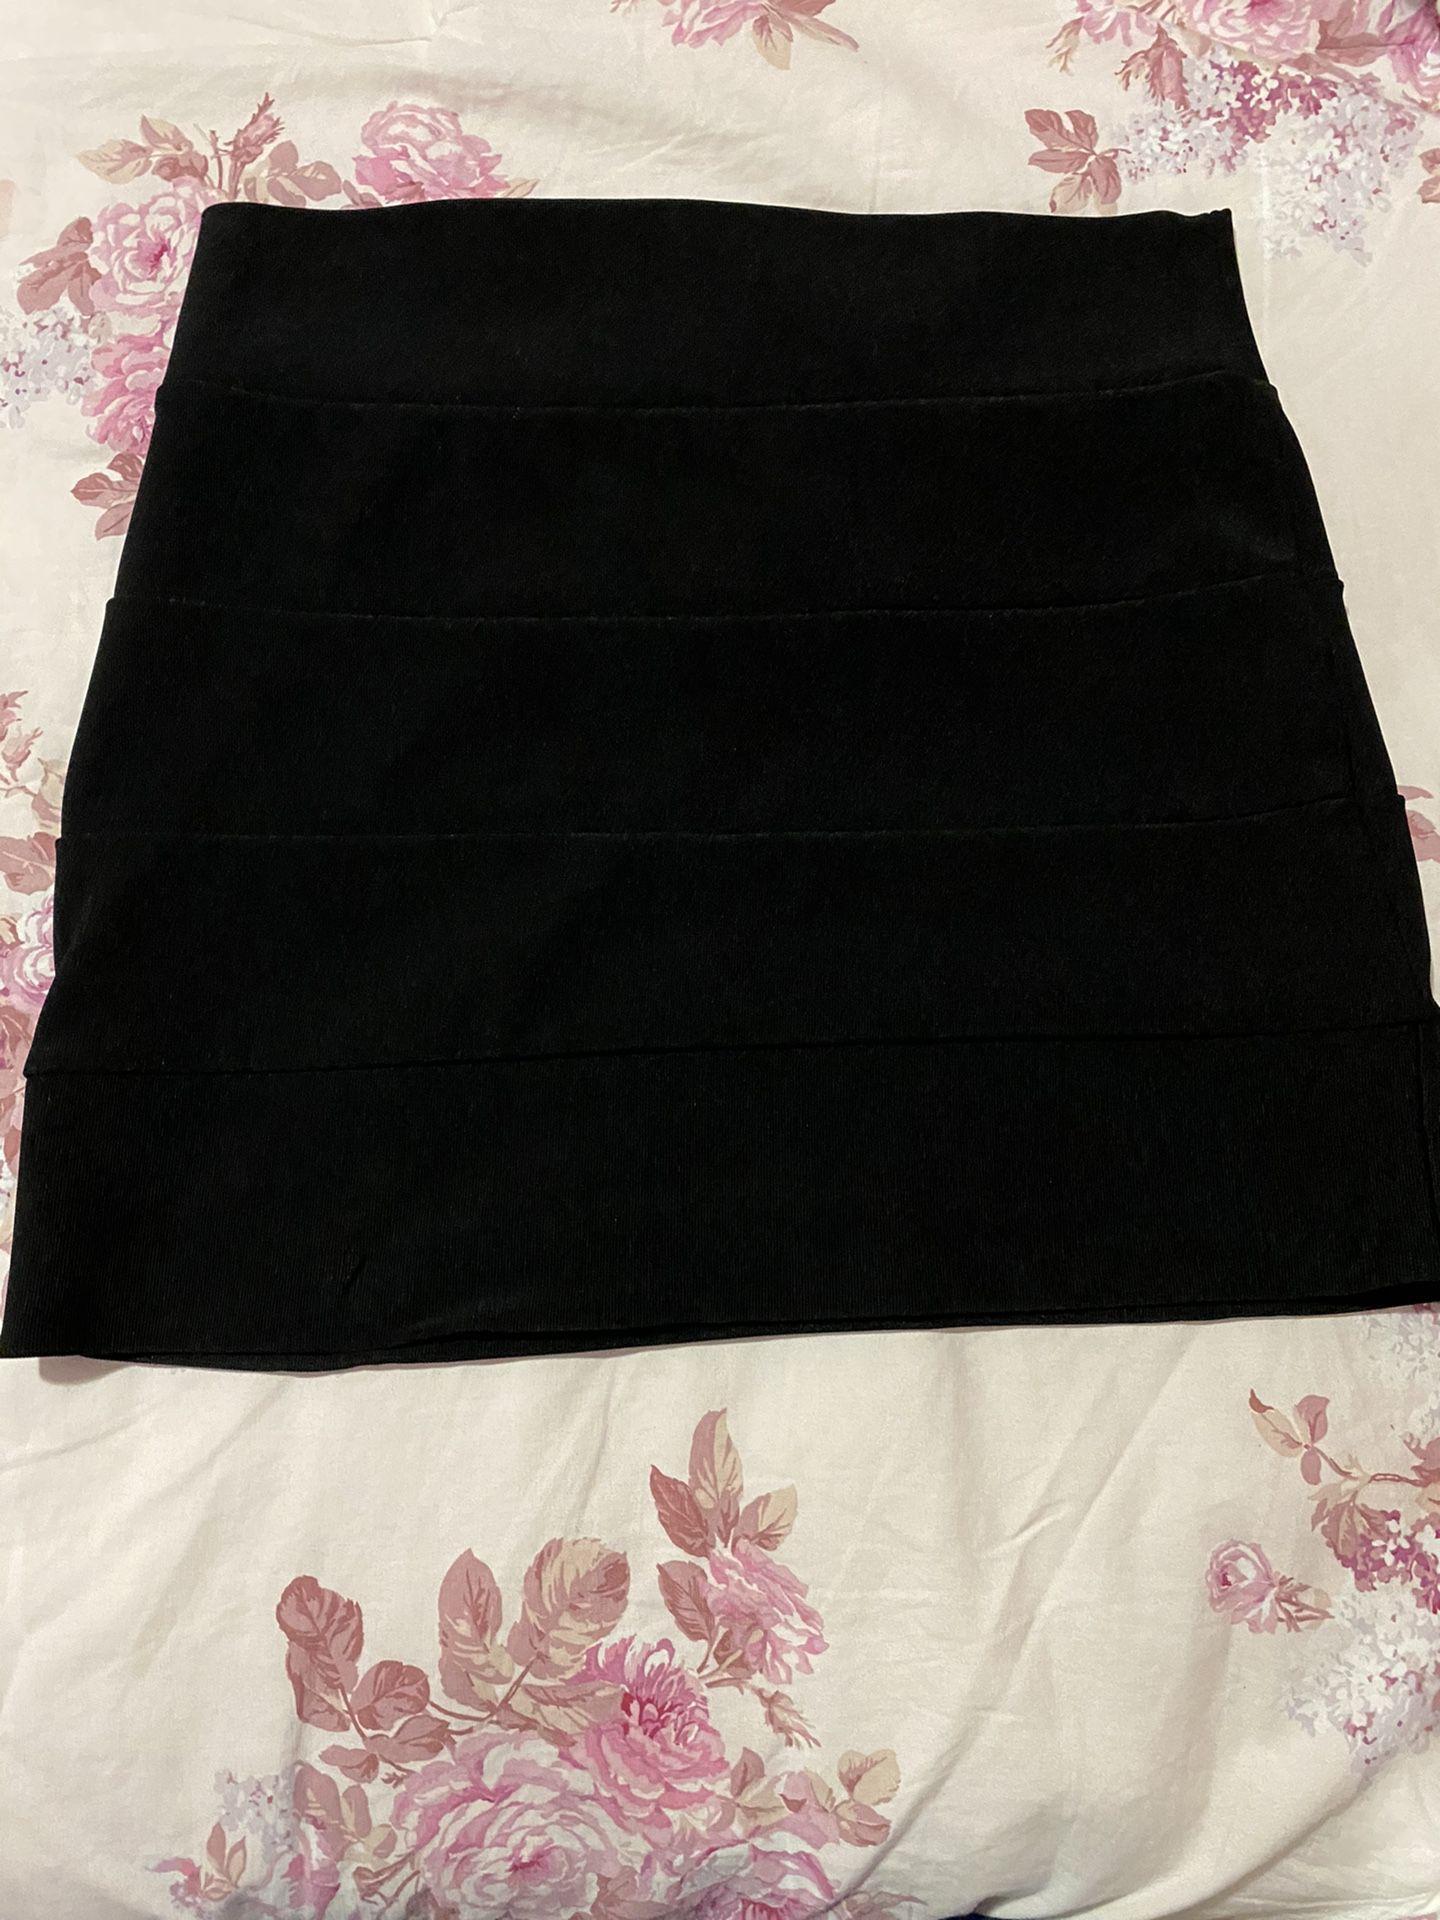 Lightly Worn Black Pencil Skirt $4